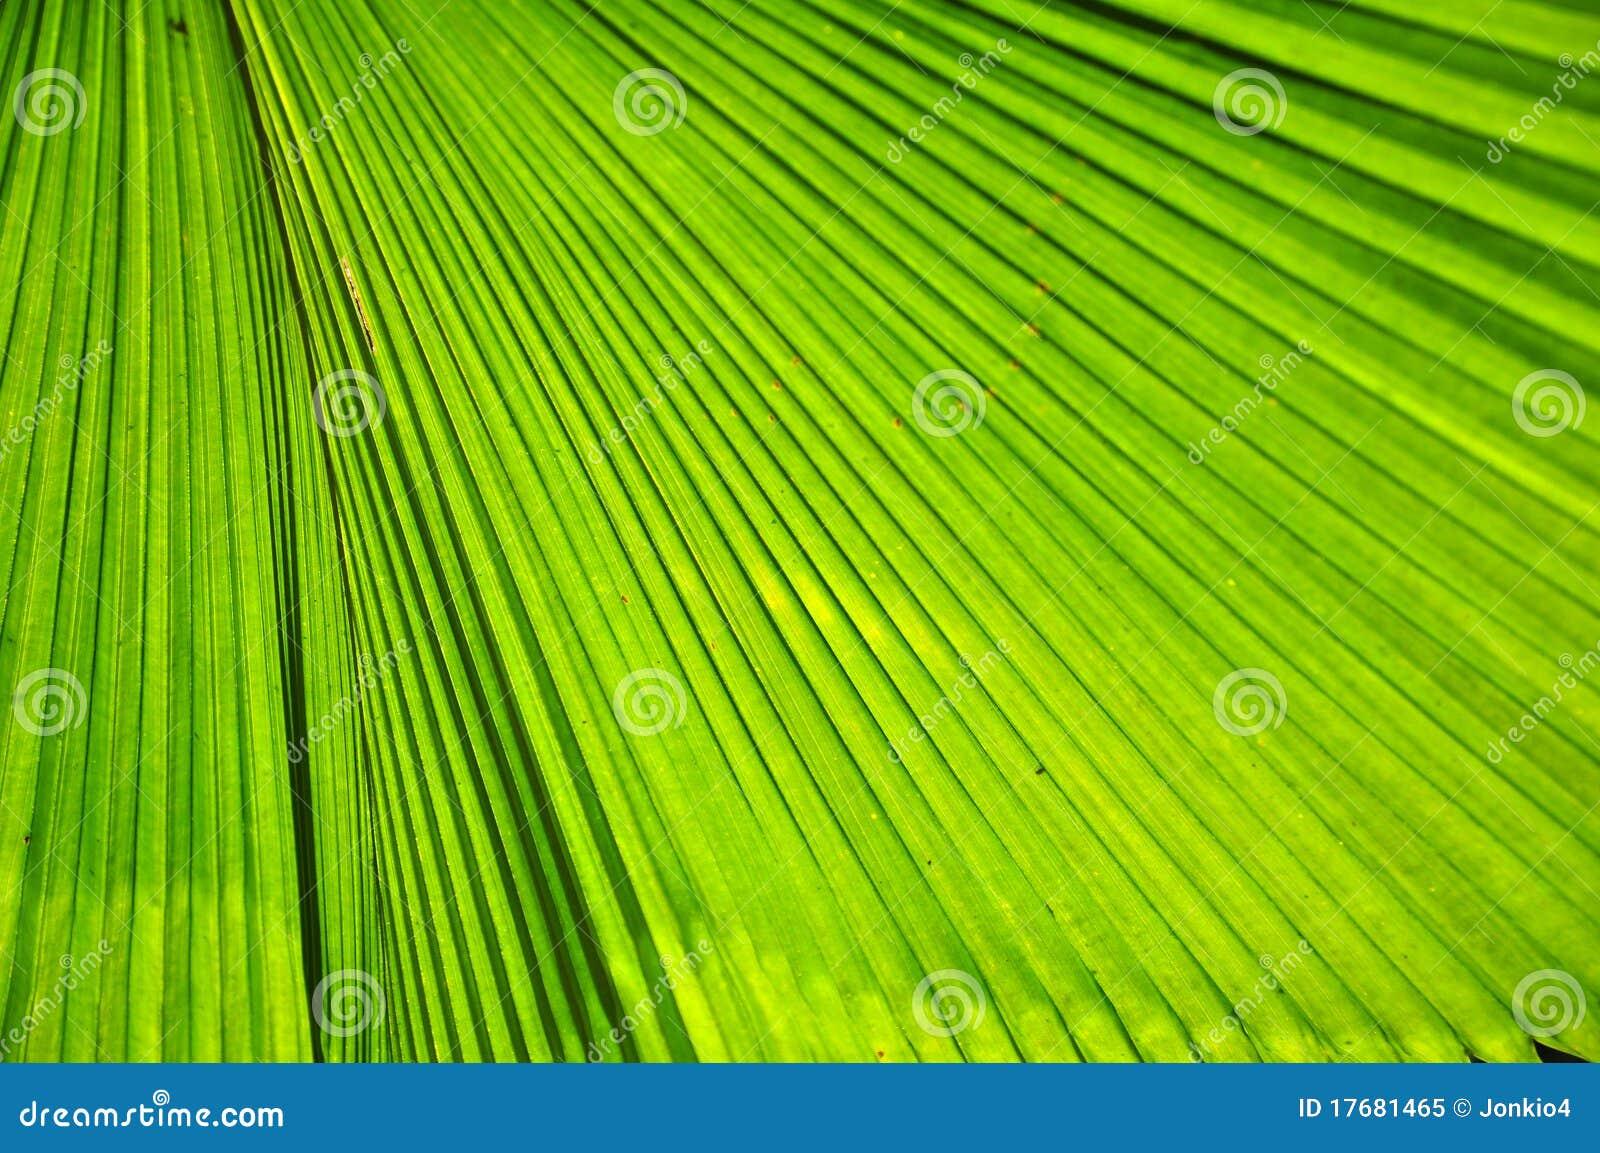 Liść zielona palma